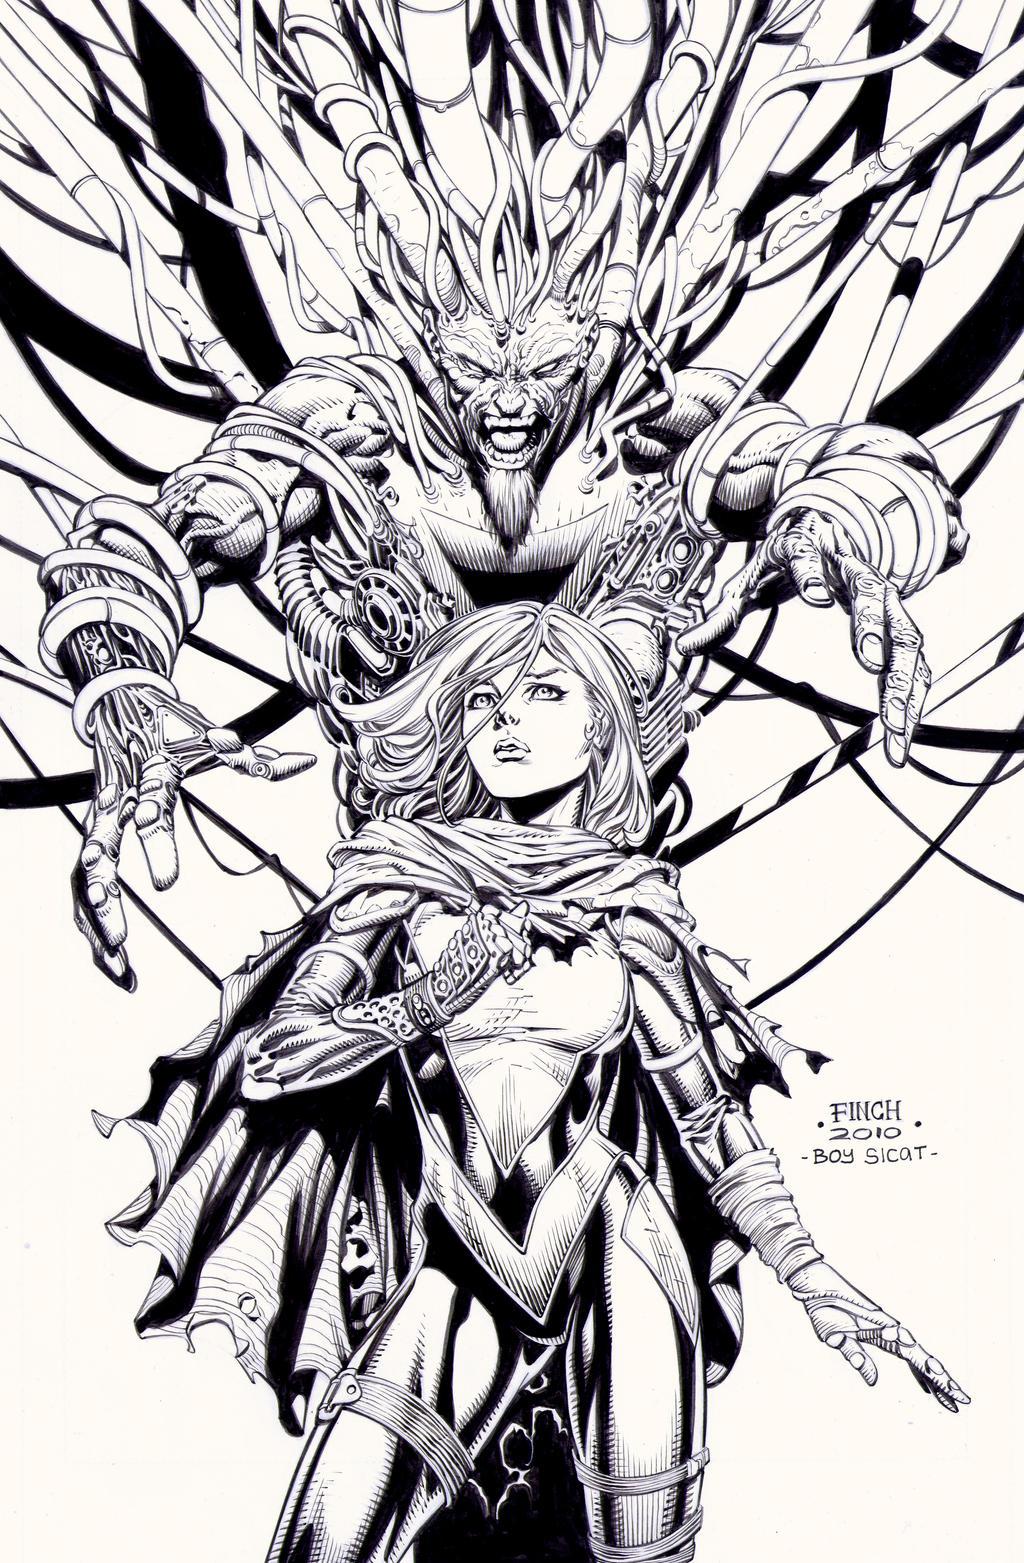 X-Force 26: David Finch by boysicat on DeviantArt